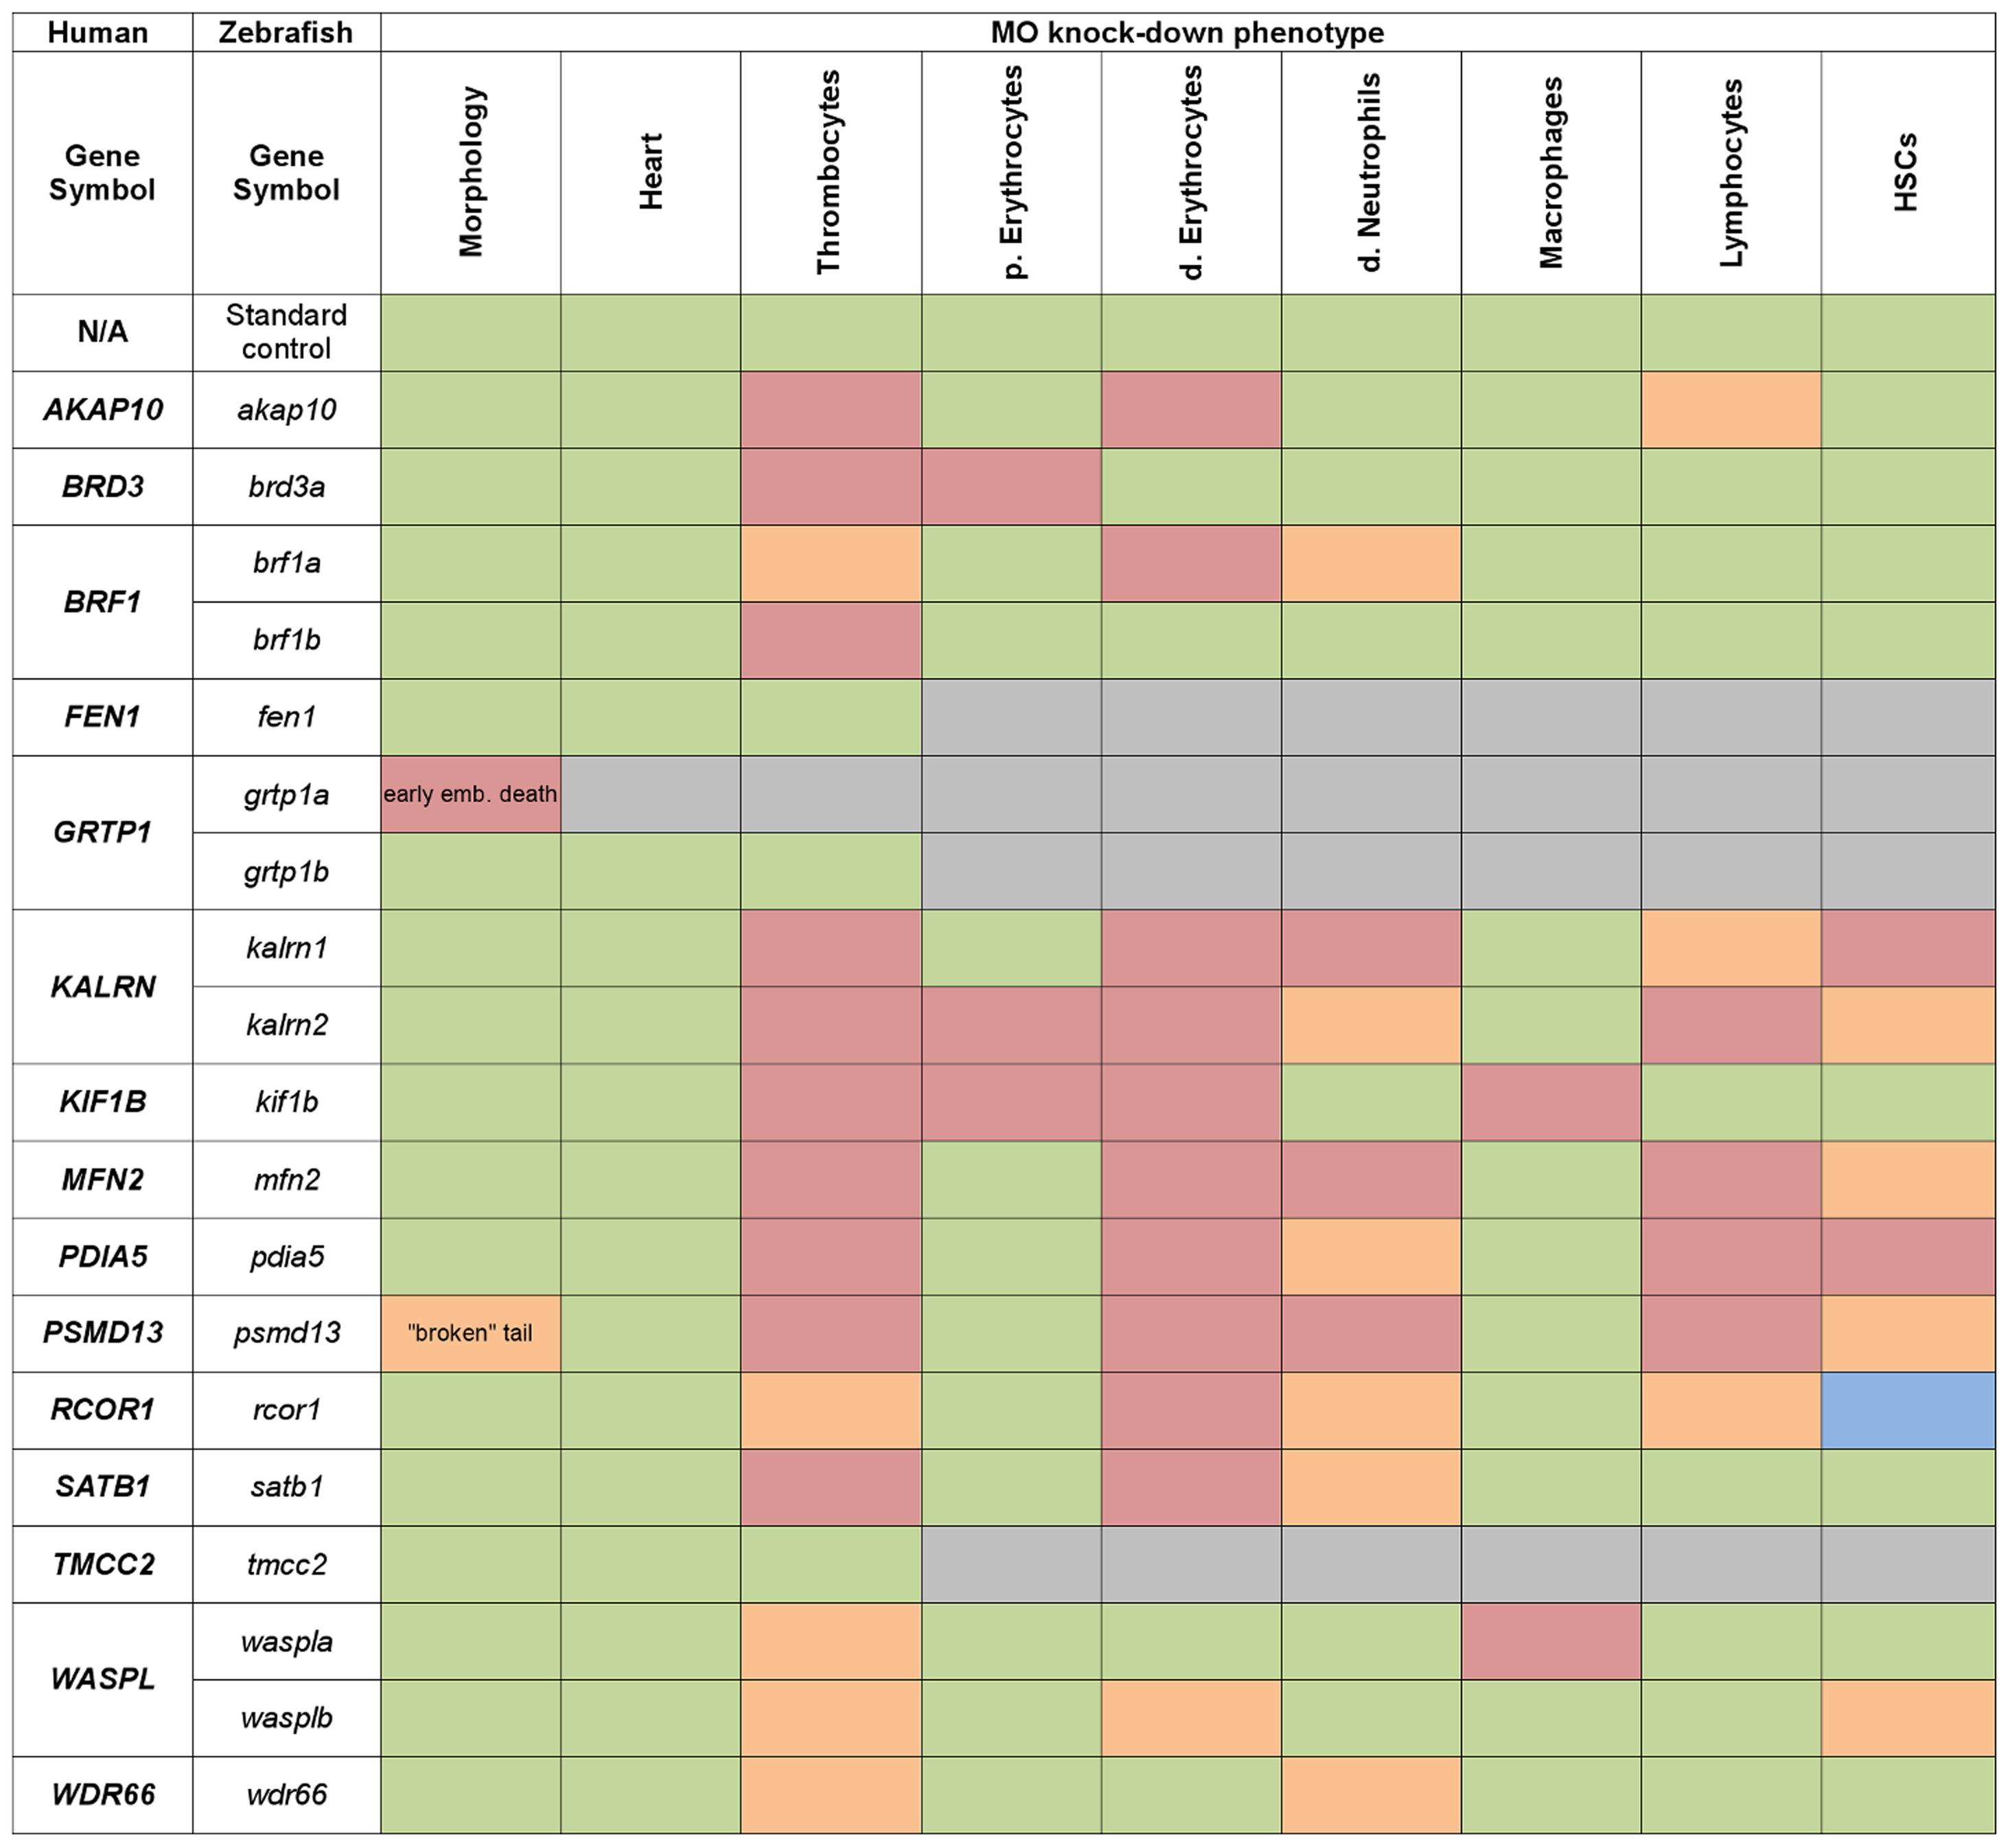 Heat map summarising hematopoietic phenotypes of knock-down of 19 candidate genes.